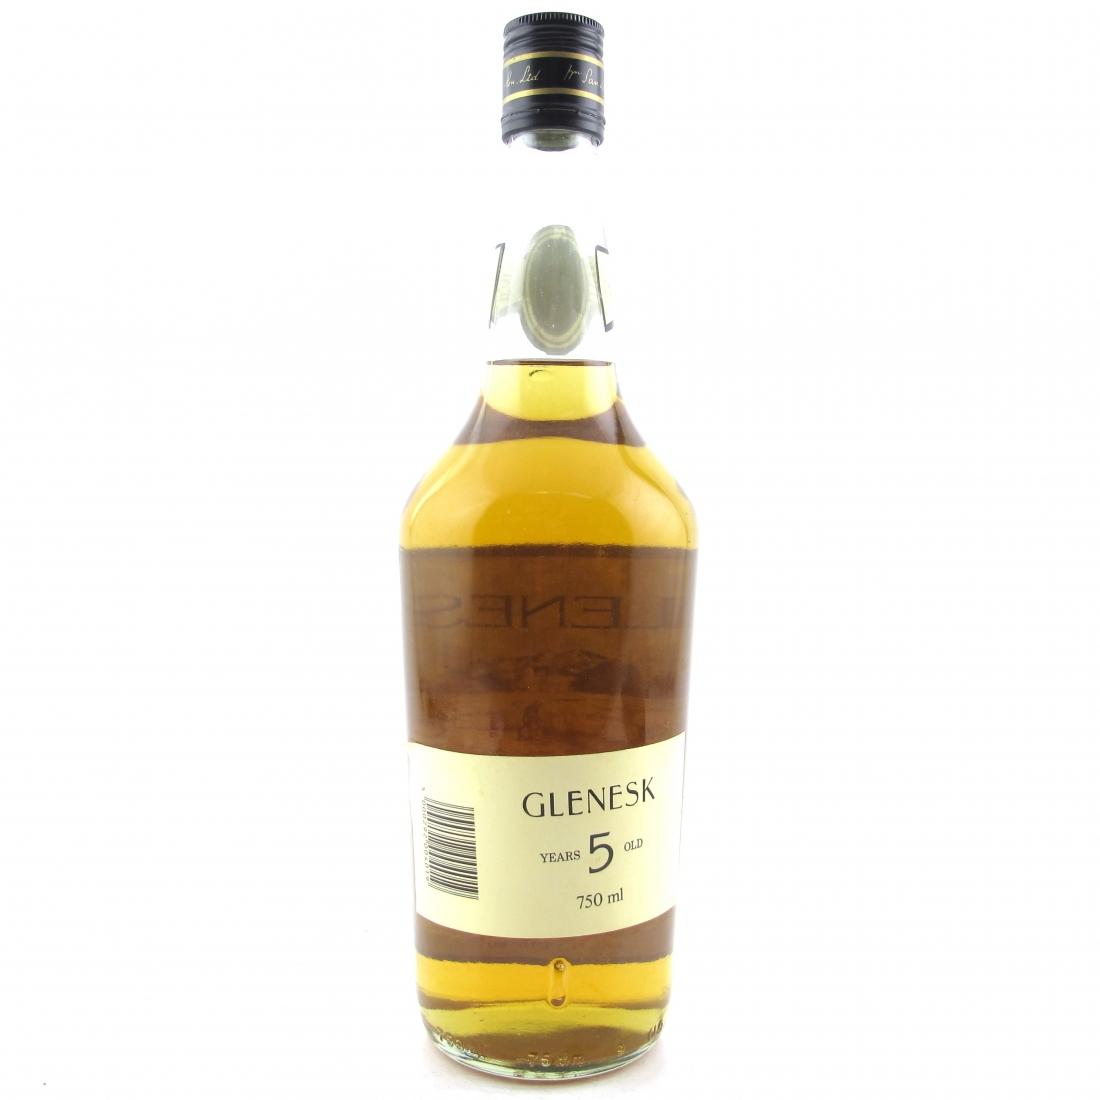 Glenesk 5 Year Old 1980s / Buton Import